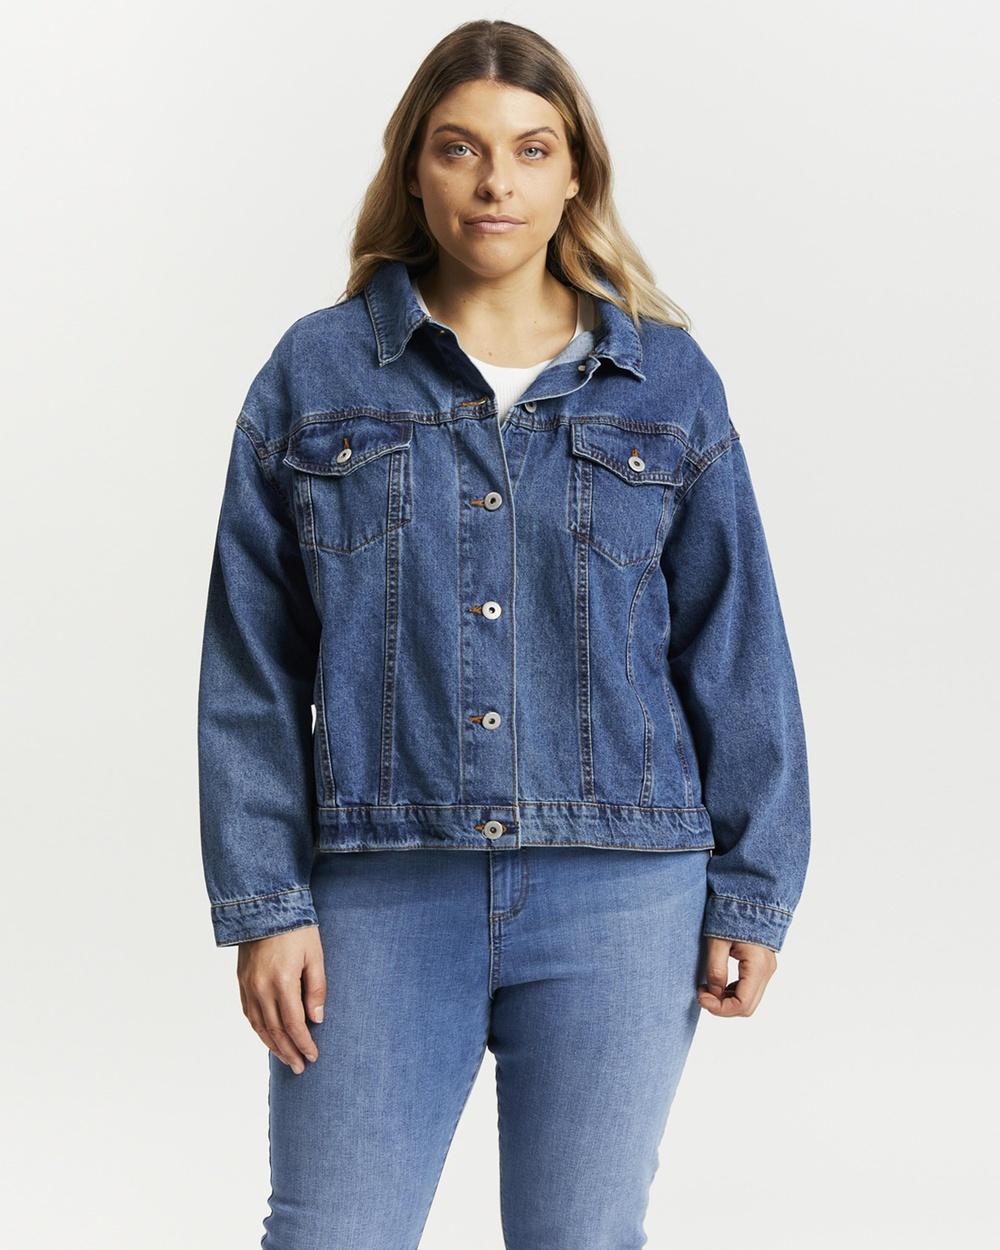 Cotton On Curve 90s Baggy Denim Jacket jacket Coogee Blue Australia